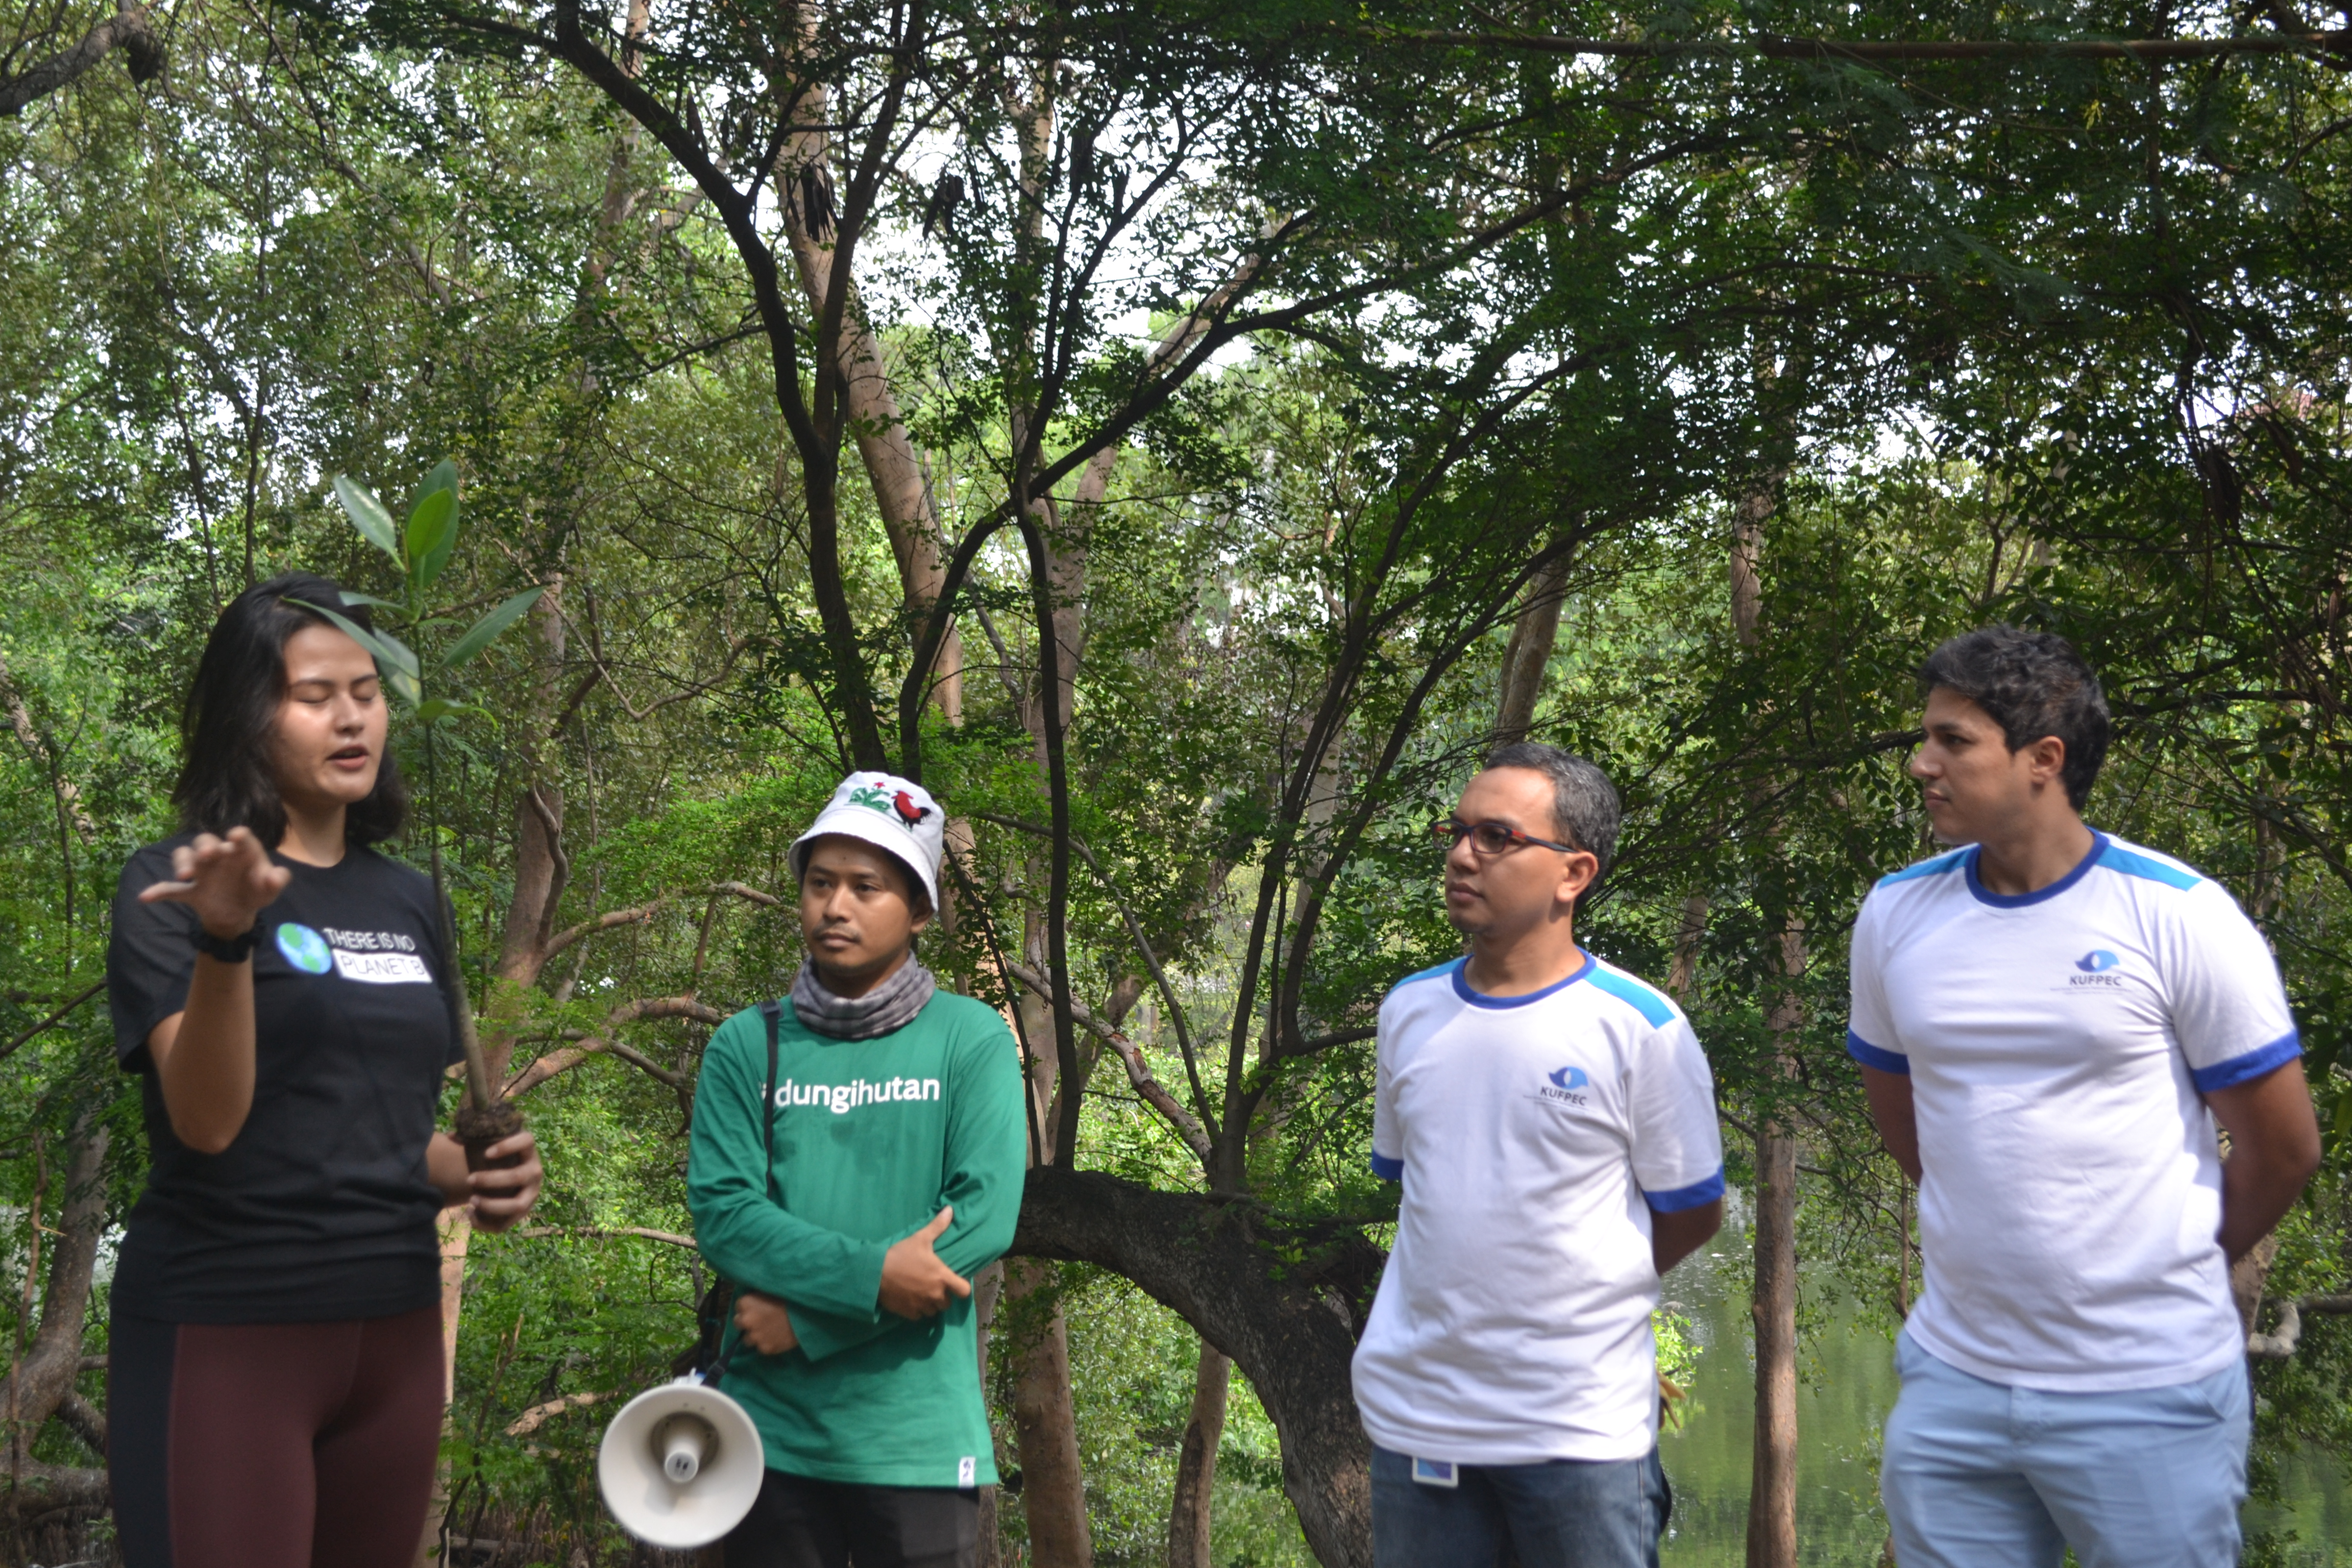 KUFPEC bersama LindungiHutan dan Relawan Hutan Jadetabek dalam aksi penanaman pohon mangrove di kawasan mangrove Pantai Indah Kapuk, Jakarta Utara